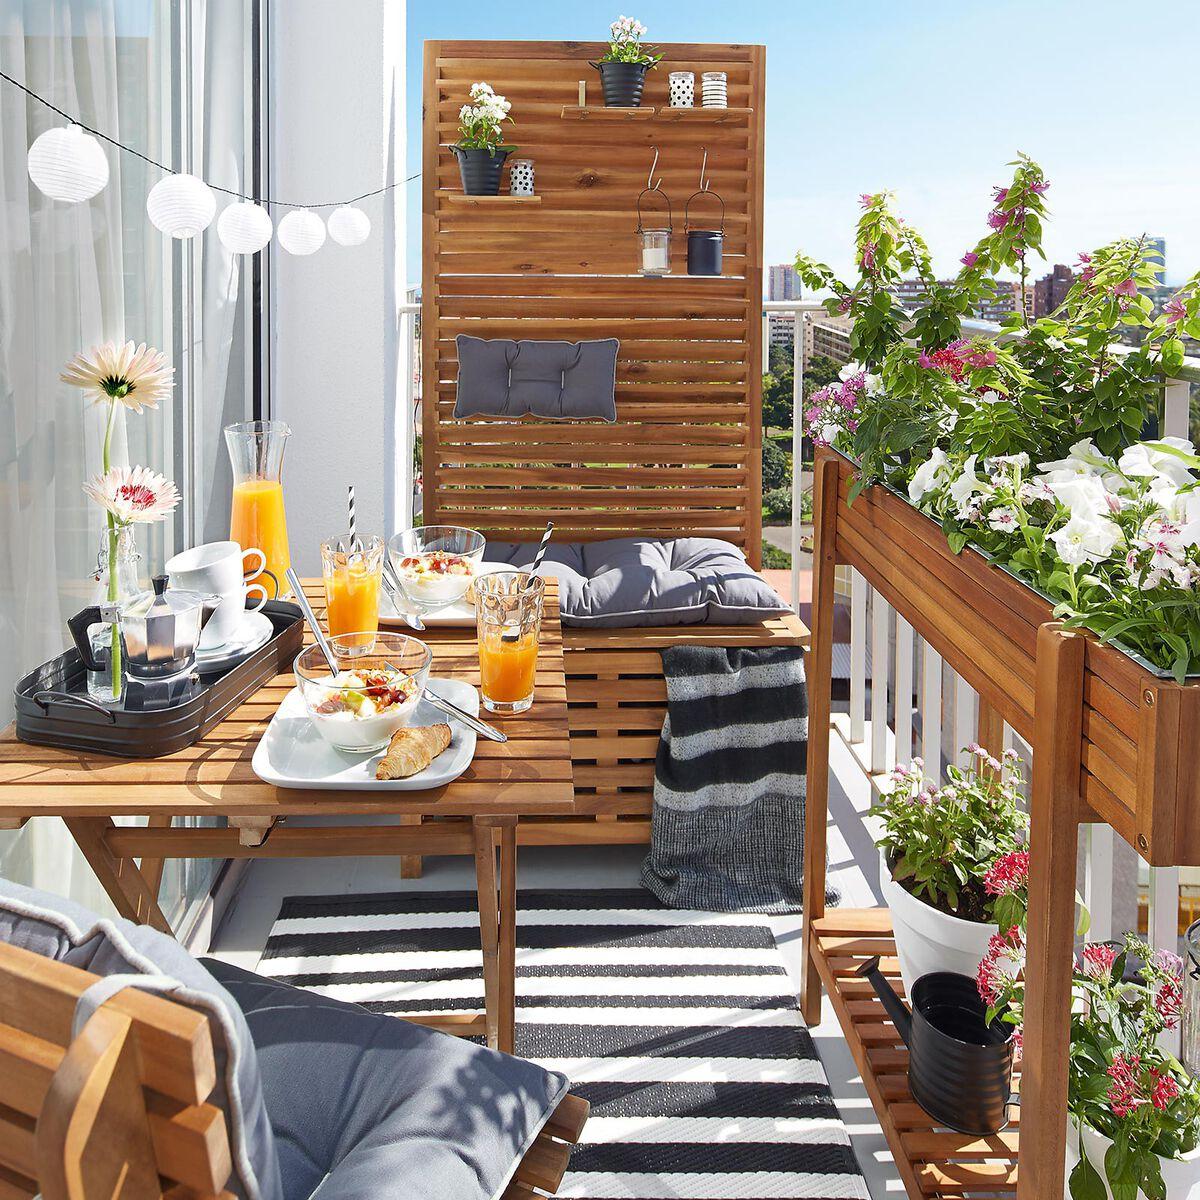 Teak Gartenmobel Vorarlberg : Sichtschutz Bank Akazienholz 100% FSC®zertifiziert natur ca L80 x B